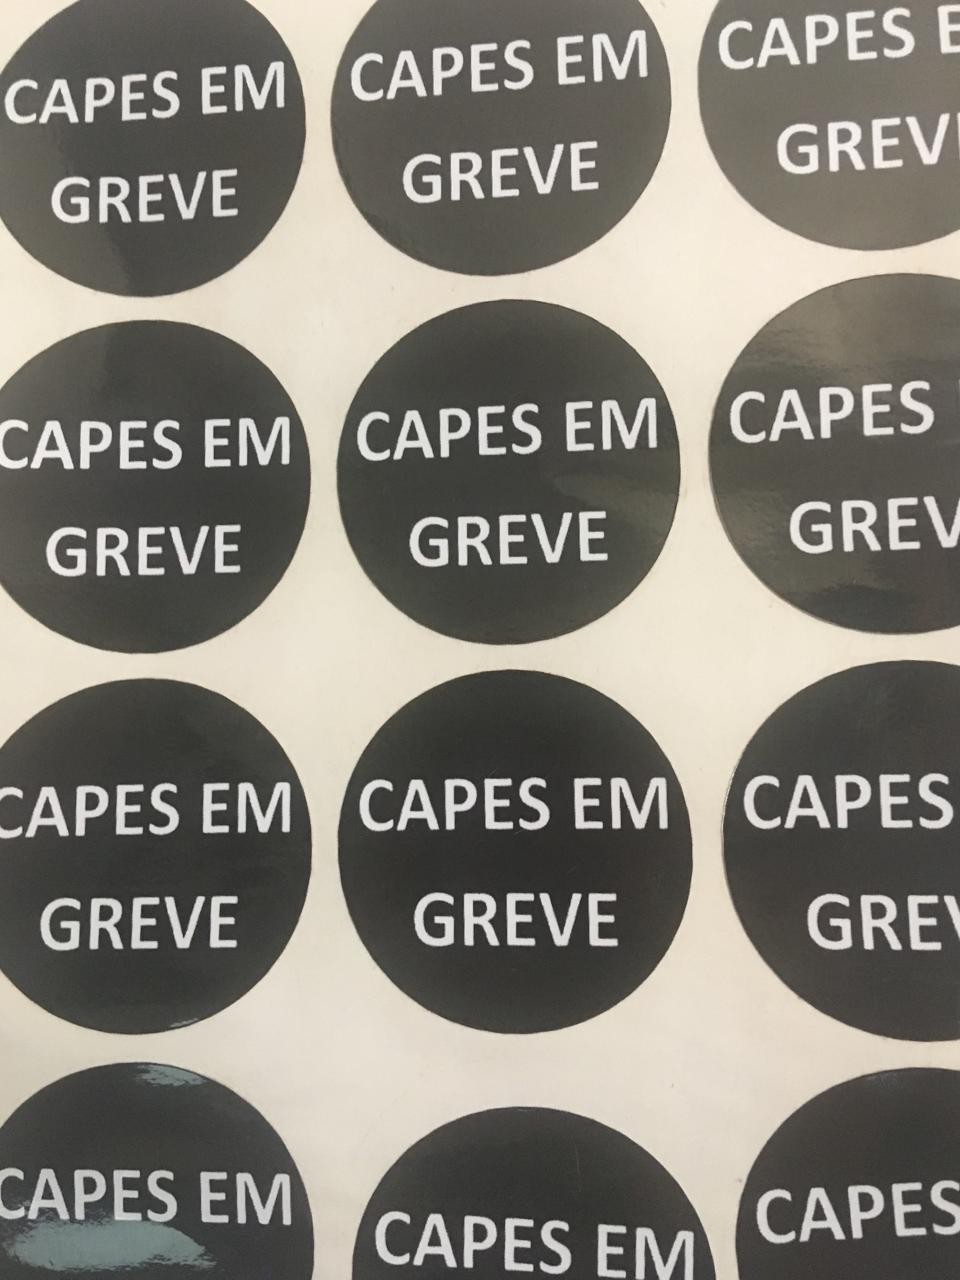 Servidores da CAPES aderem à GREVE GERAL de 14 de junho